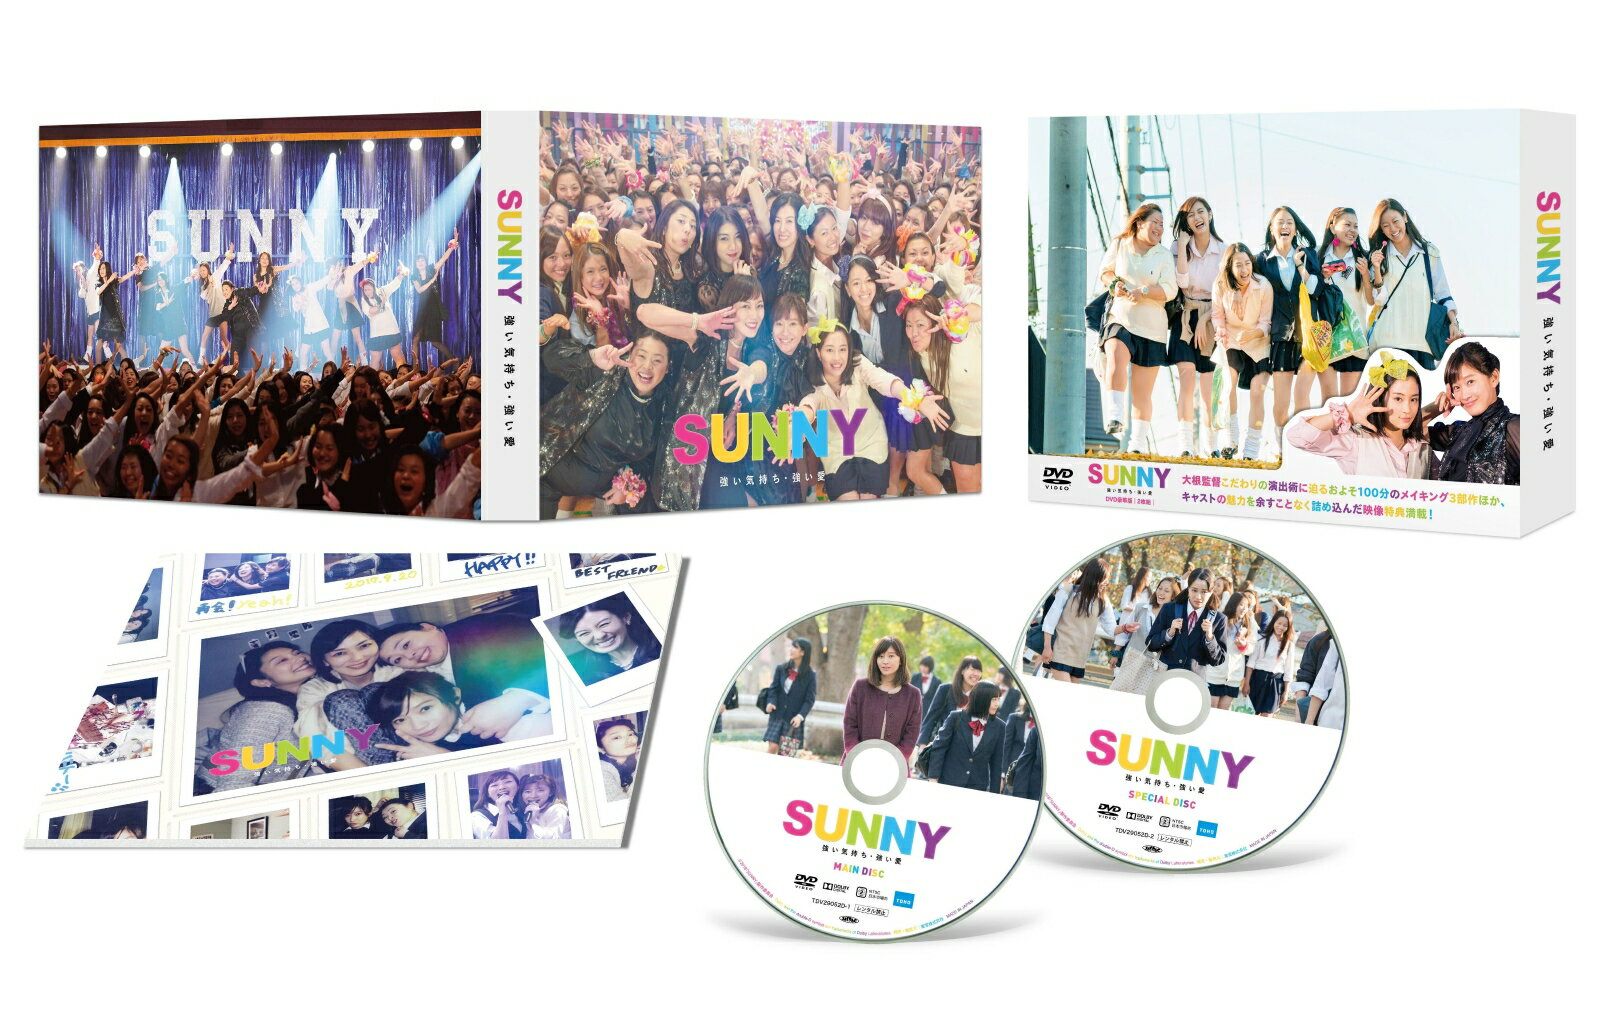 SUNNY 強い気持ち・強い愛 DVD 豪華版 [ 篠原涼子 ]